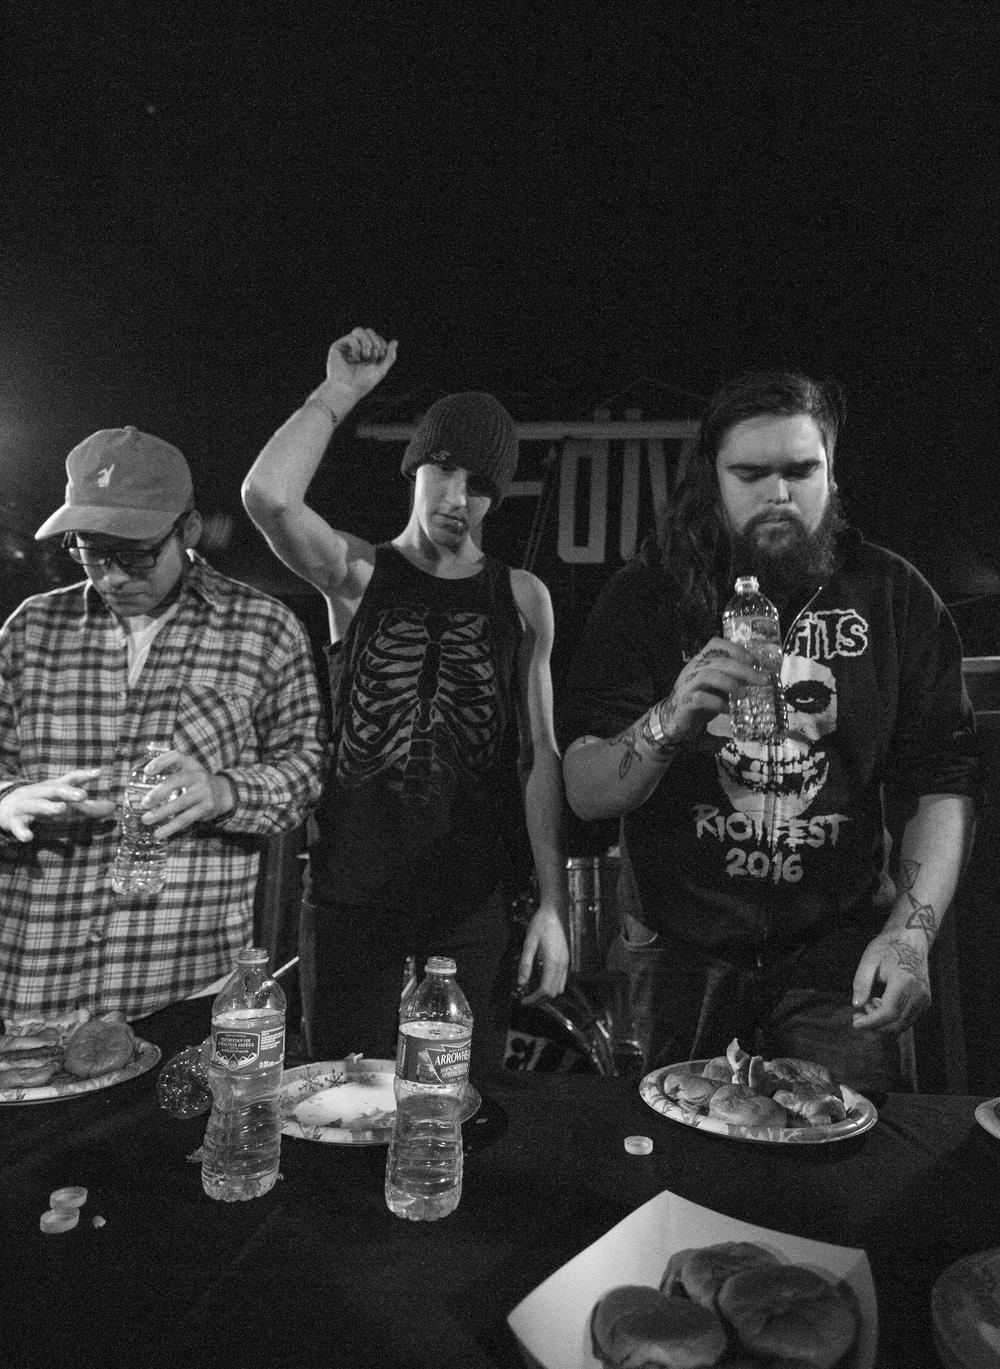 Burger champ, Andrew Renfrow, center